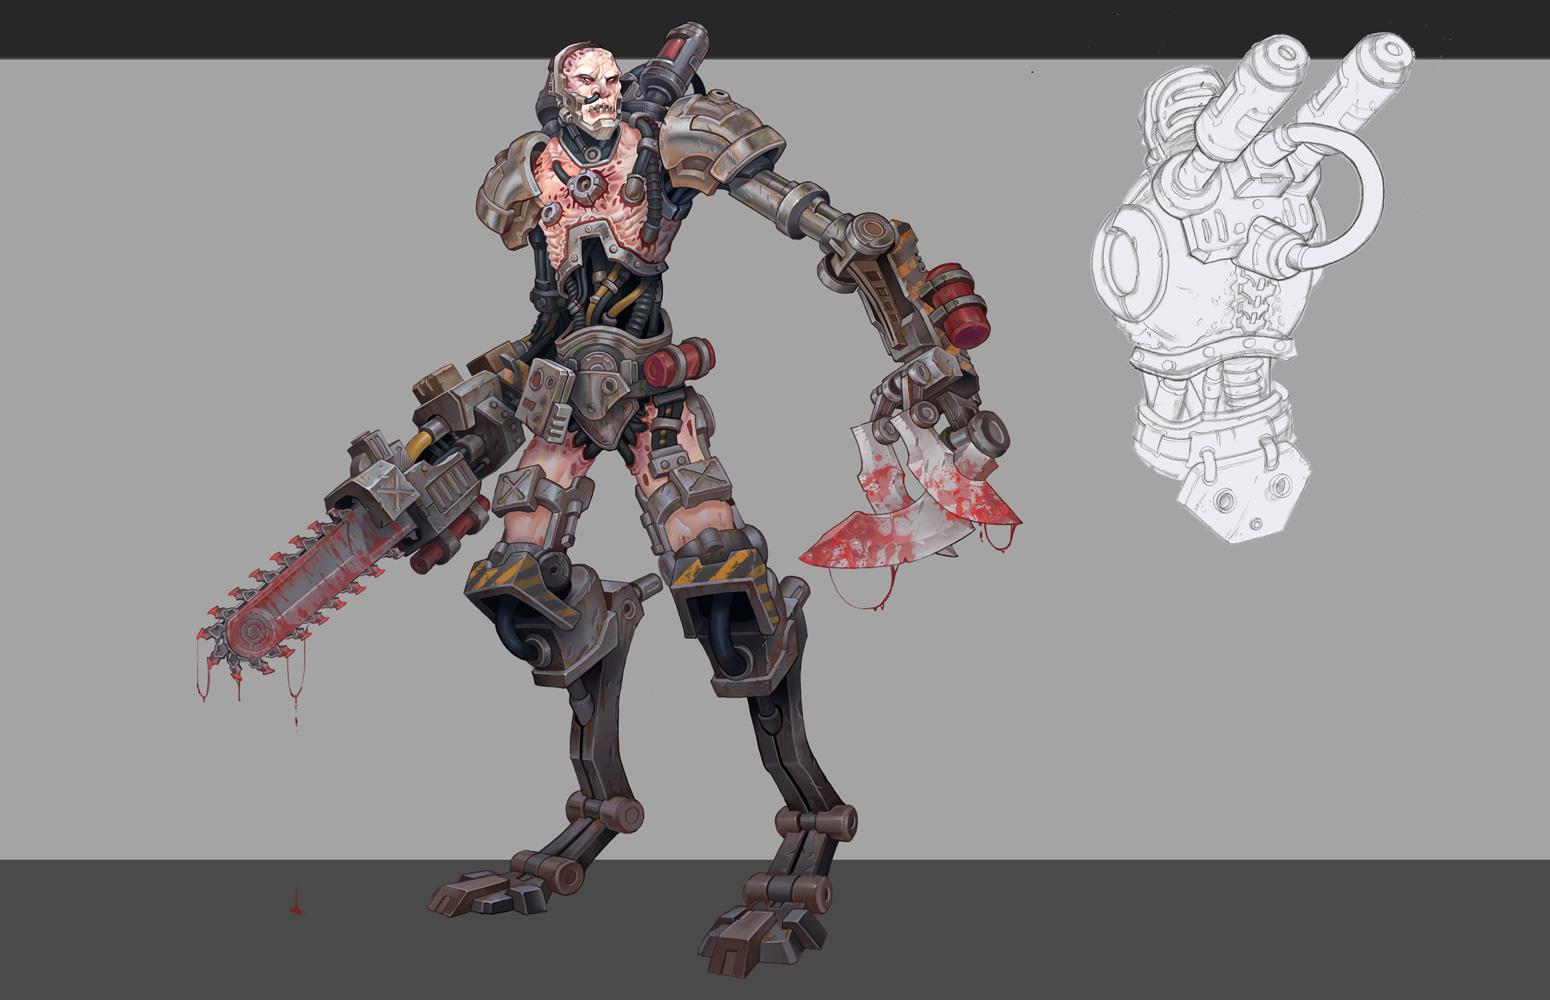 [E3] Eternal Crusade, un MMO Warhammer 40K - Page 3 1